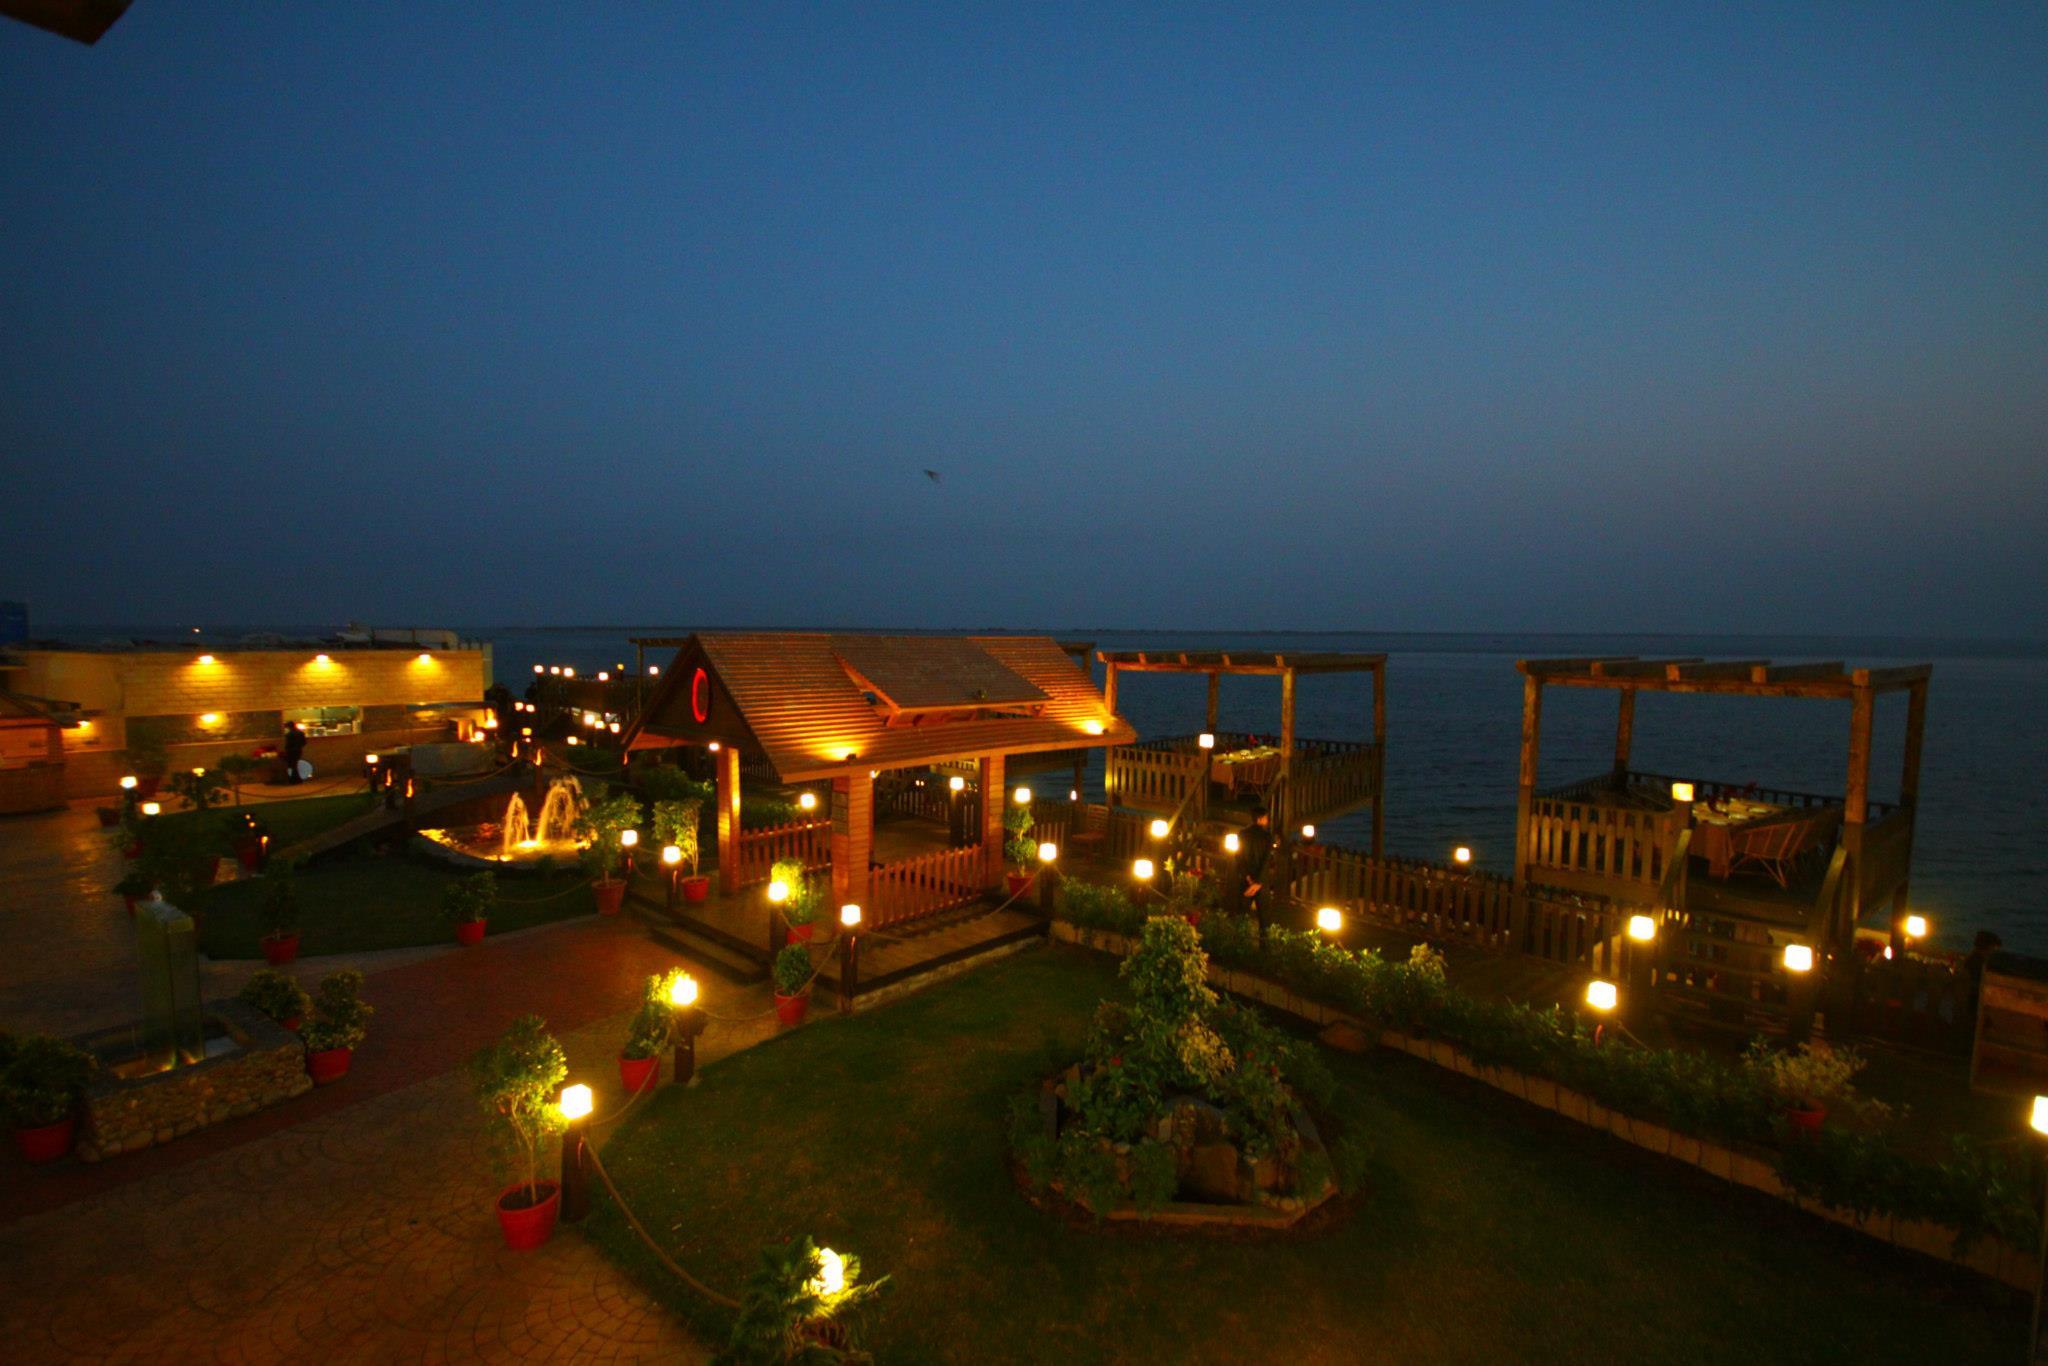 Charcoal-BBQ-n-Grill-Restaurant-at-Do-Darya-DHA-Karachi-1